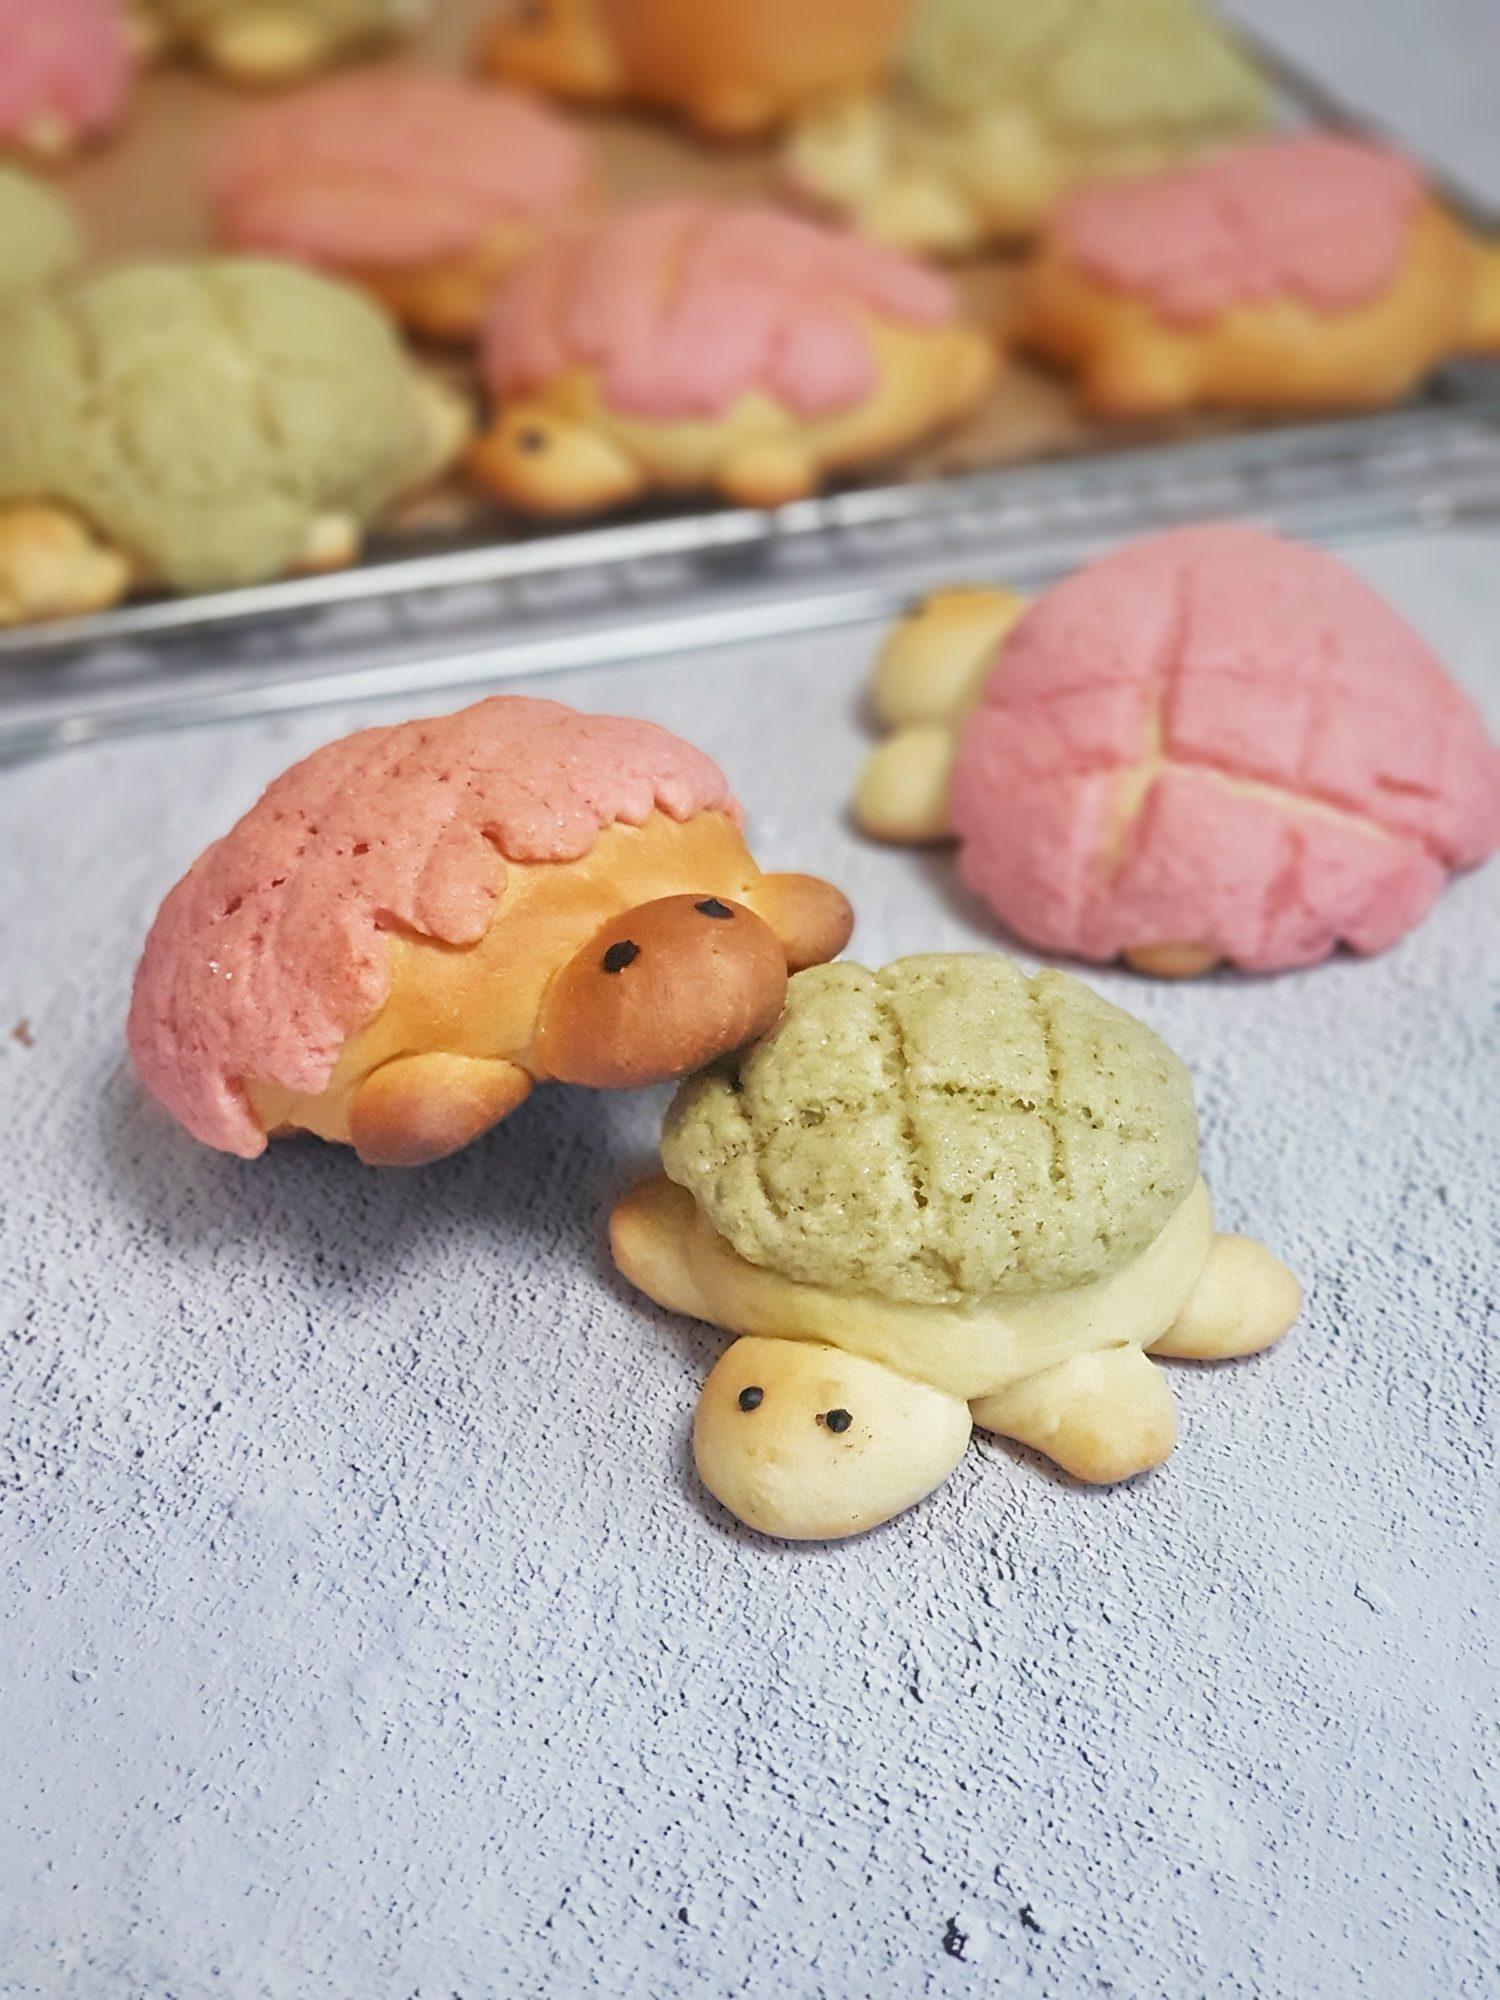 pineapple bun or turtle melon pun